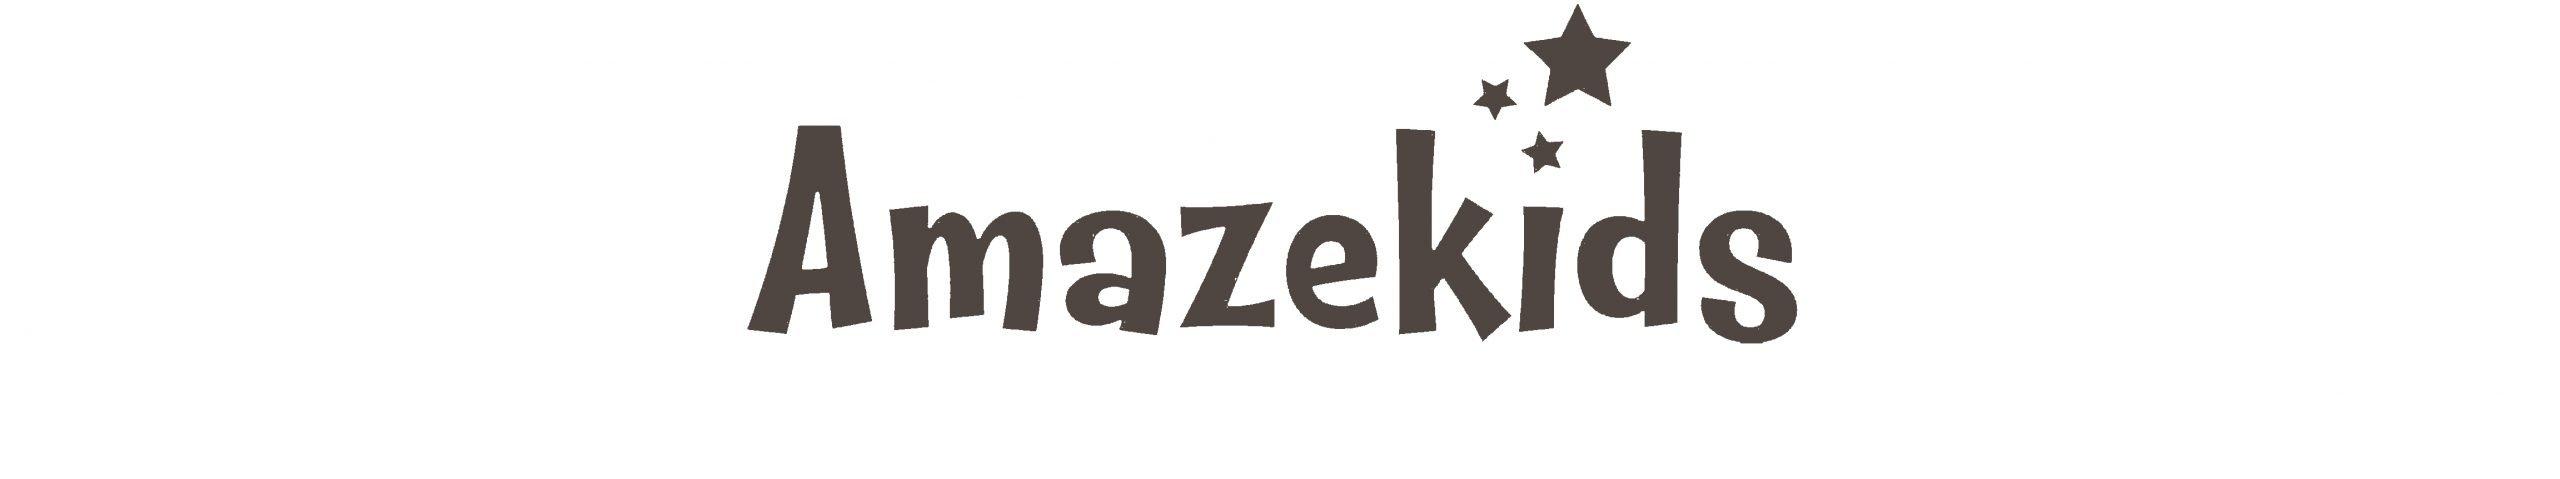 amazekids